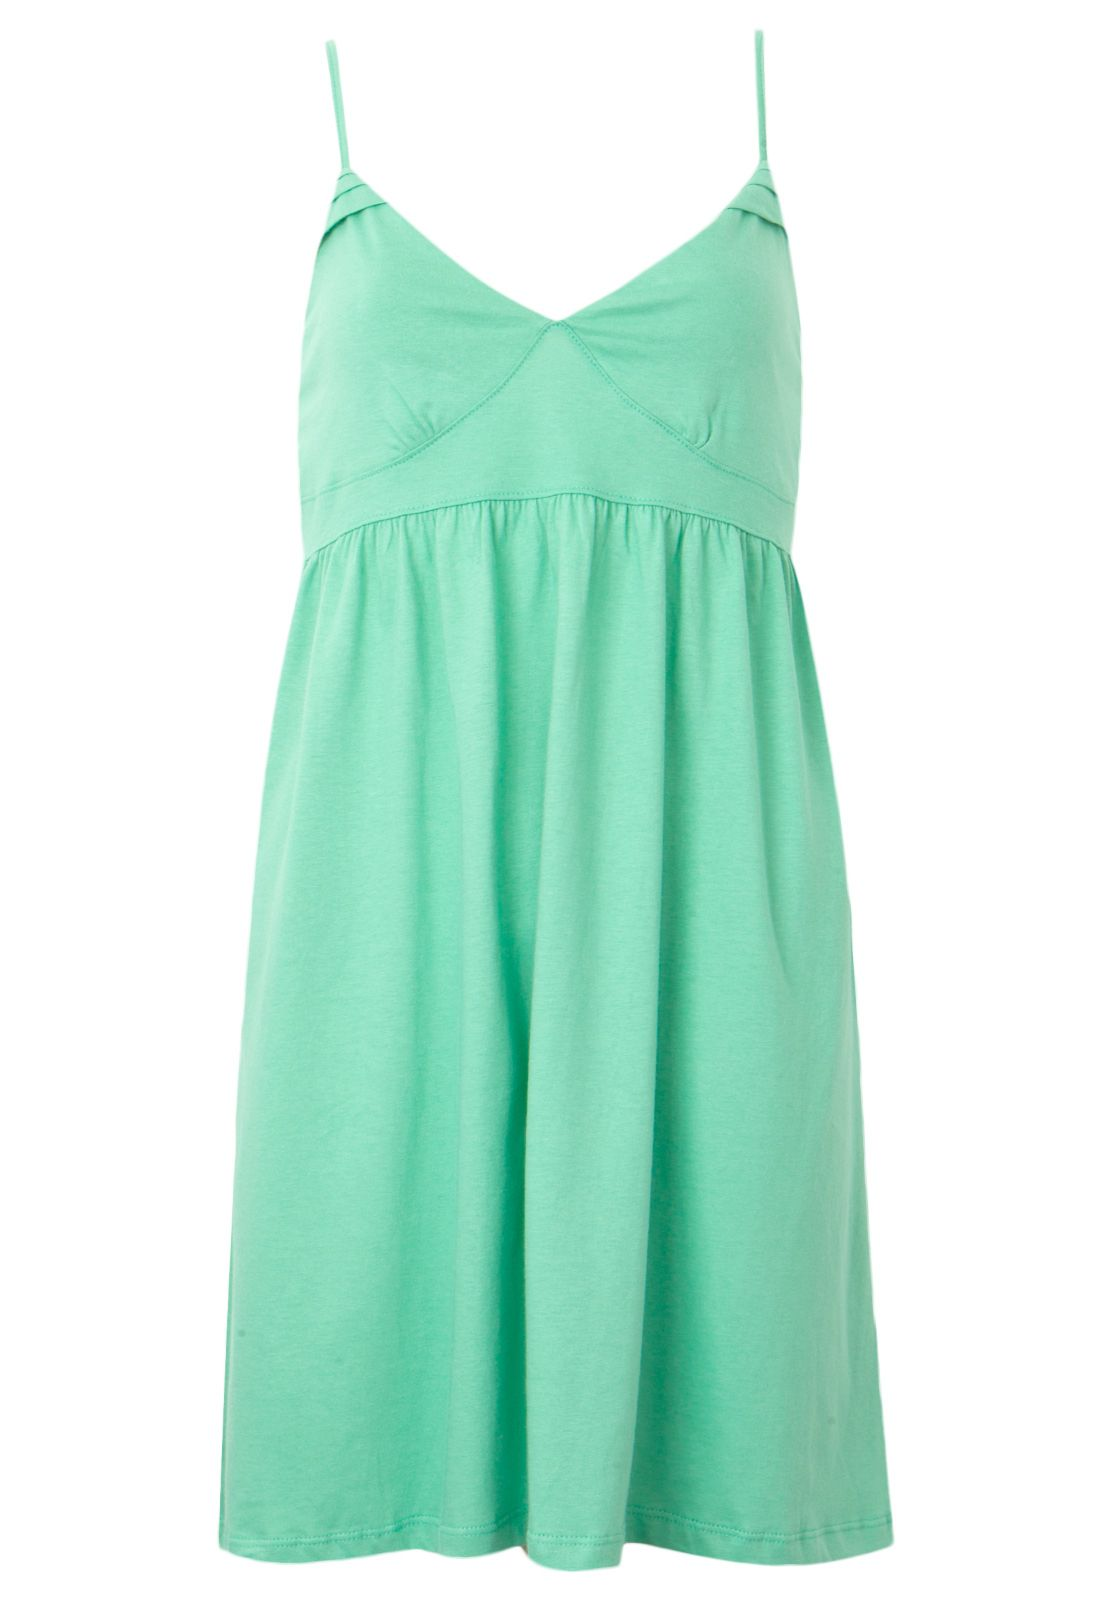 Vestido FiveBlu Recorte Verde - Compre Agora | Dafiti Brasil